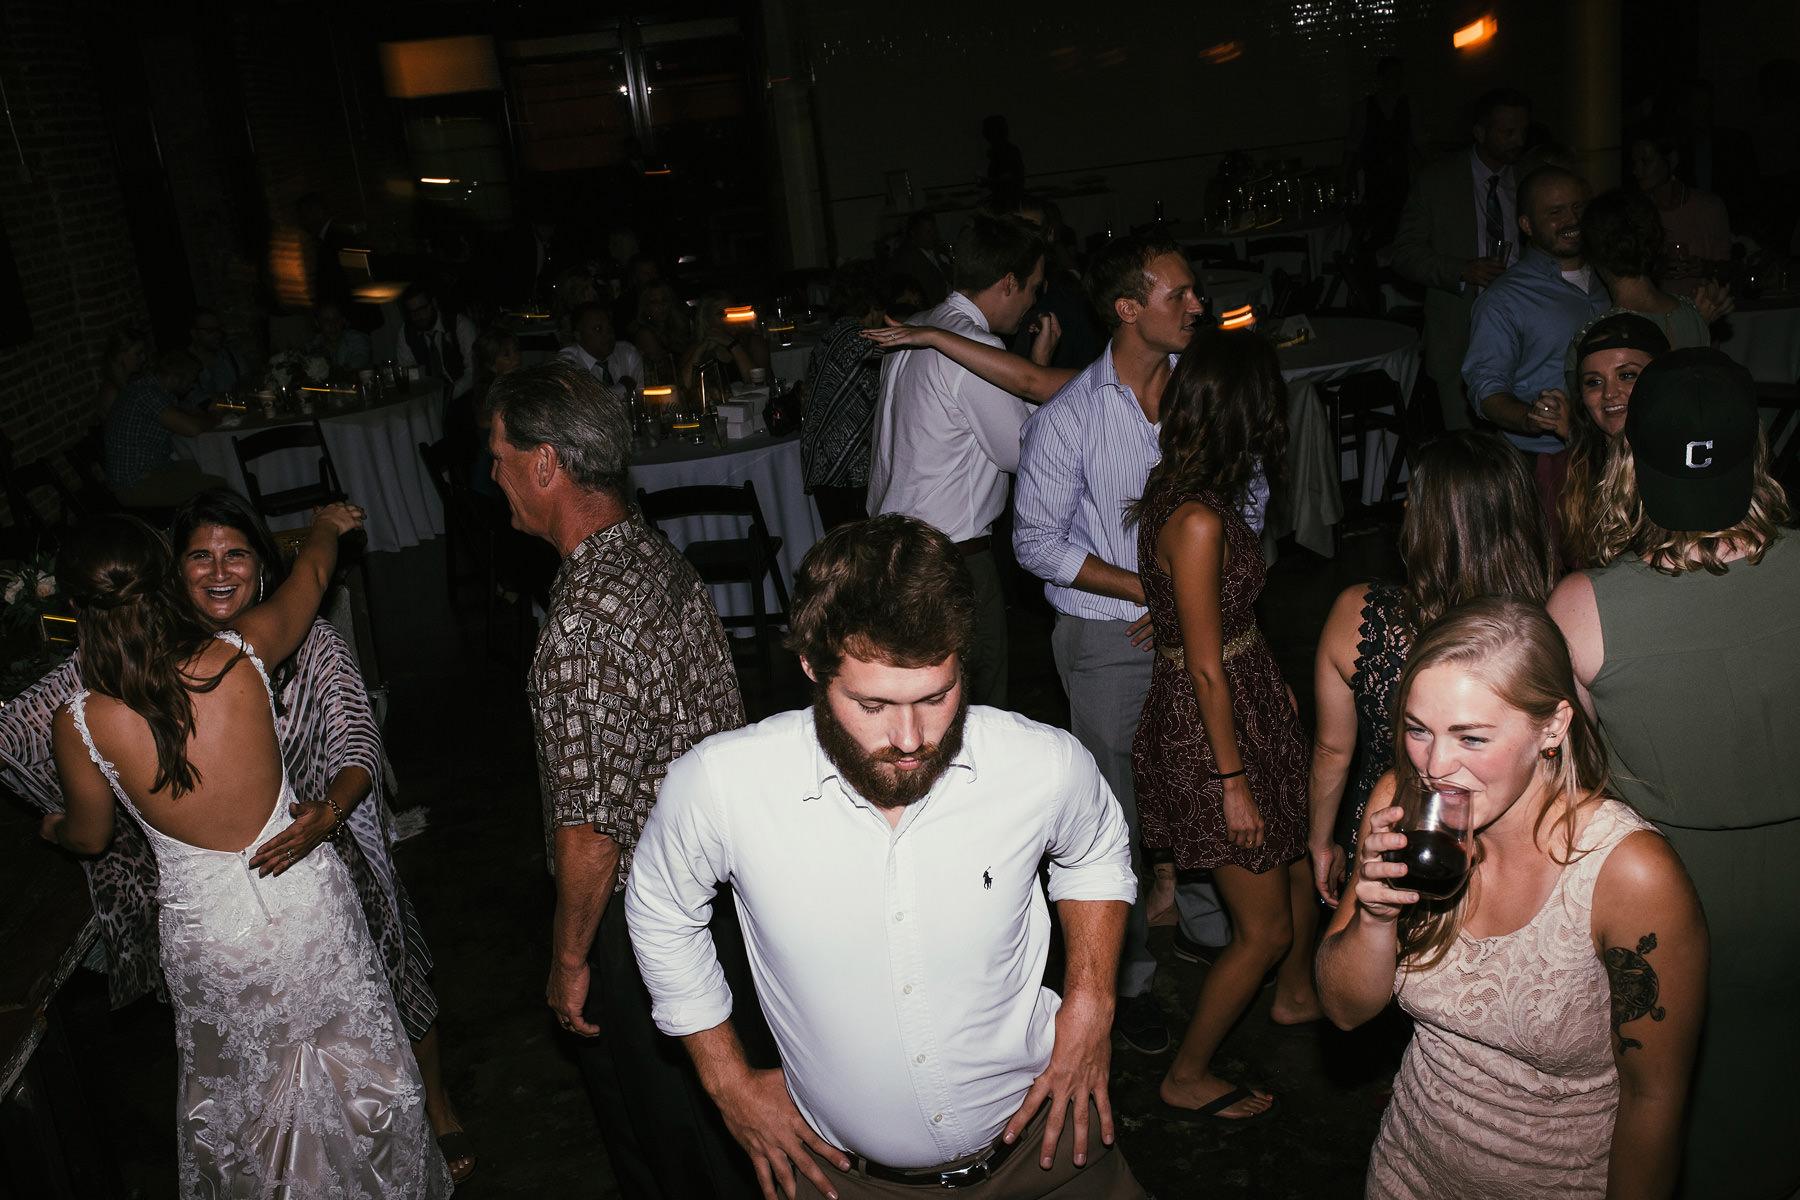 Kansas City Summer Wedding at the Guild_Kindling Wedding Photography Blog98.JPG